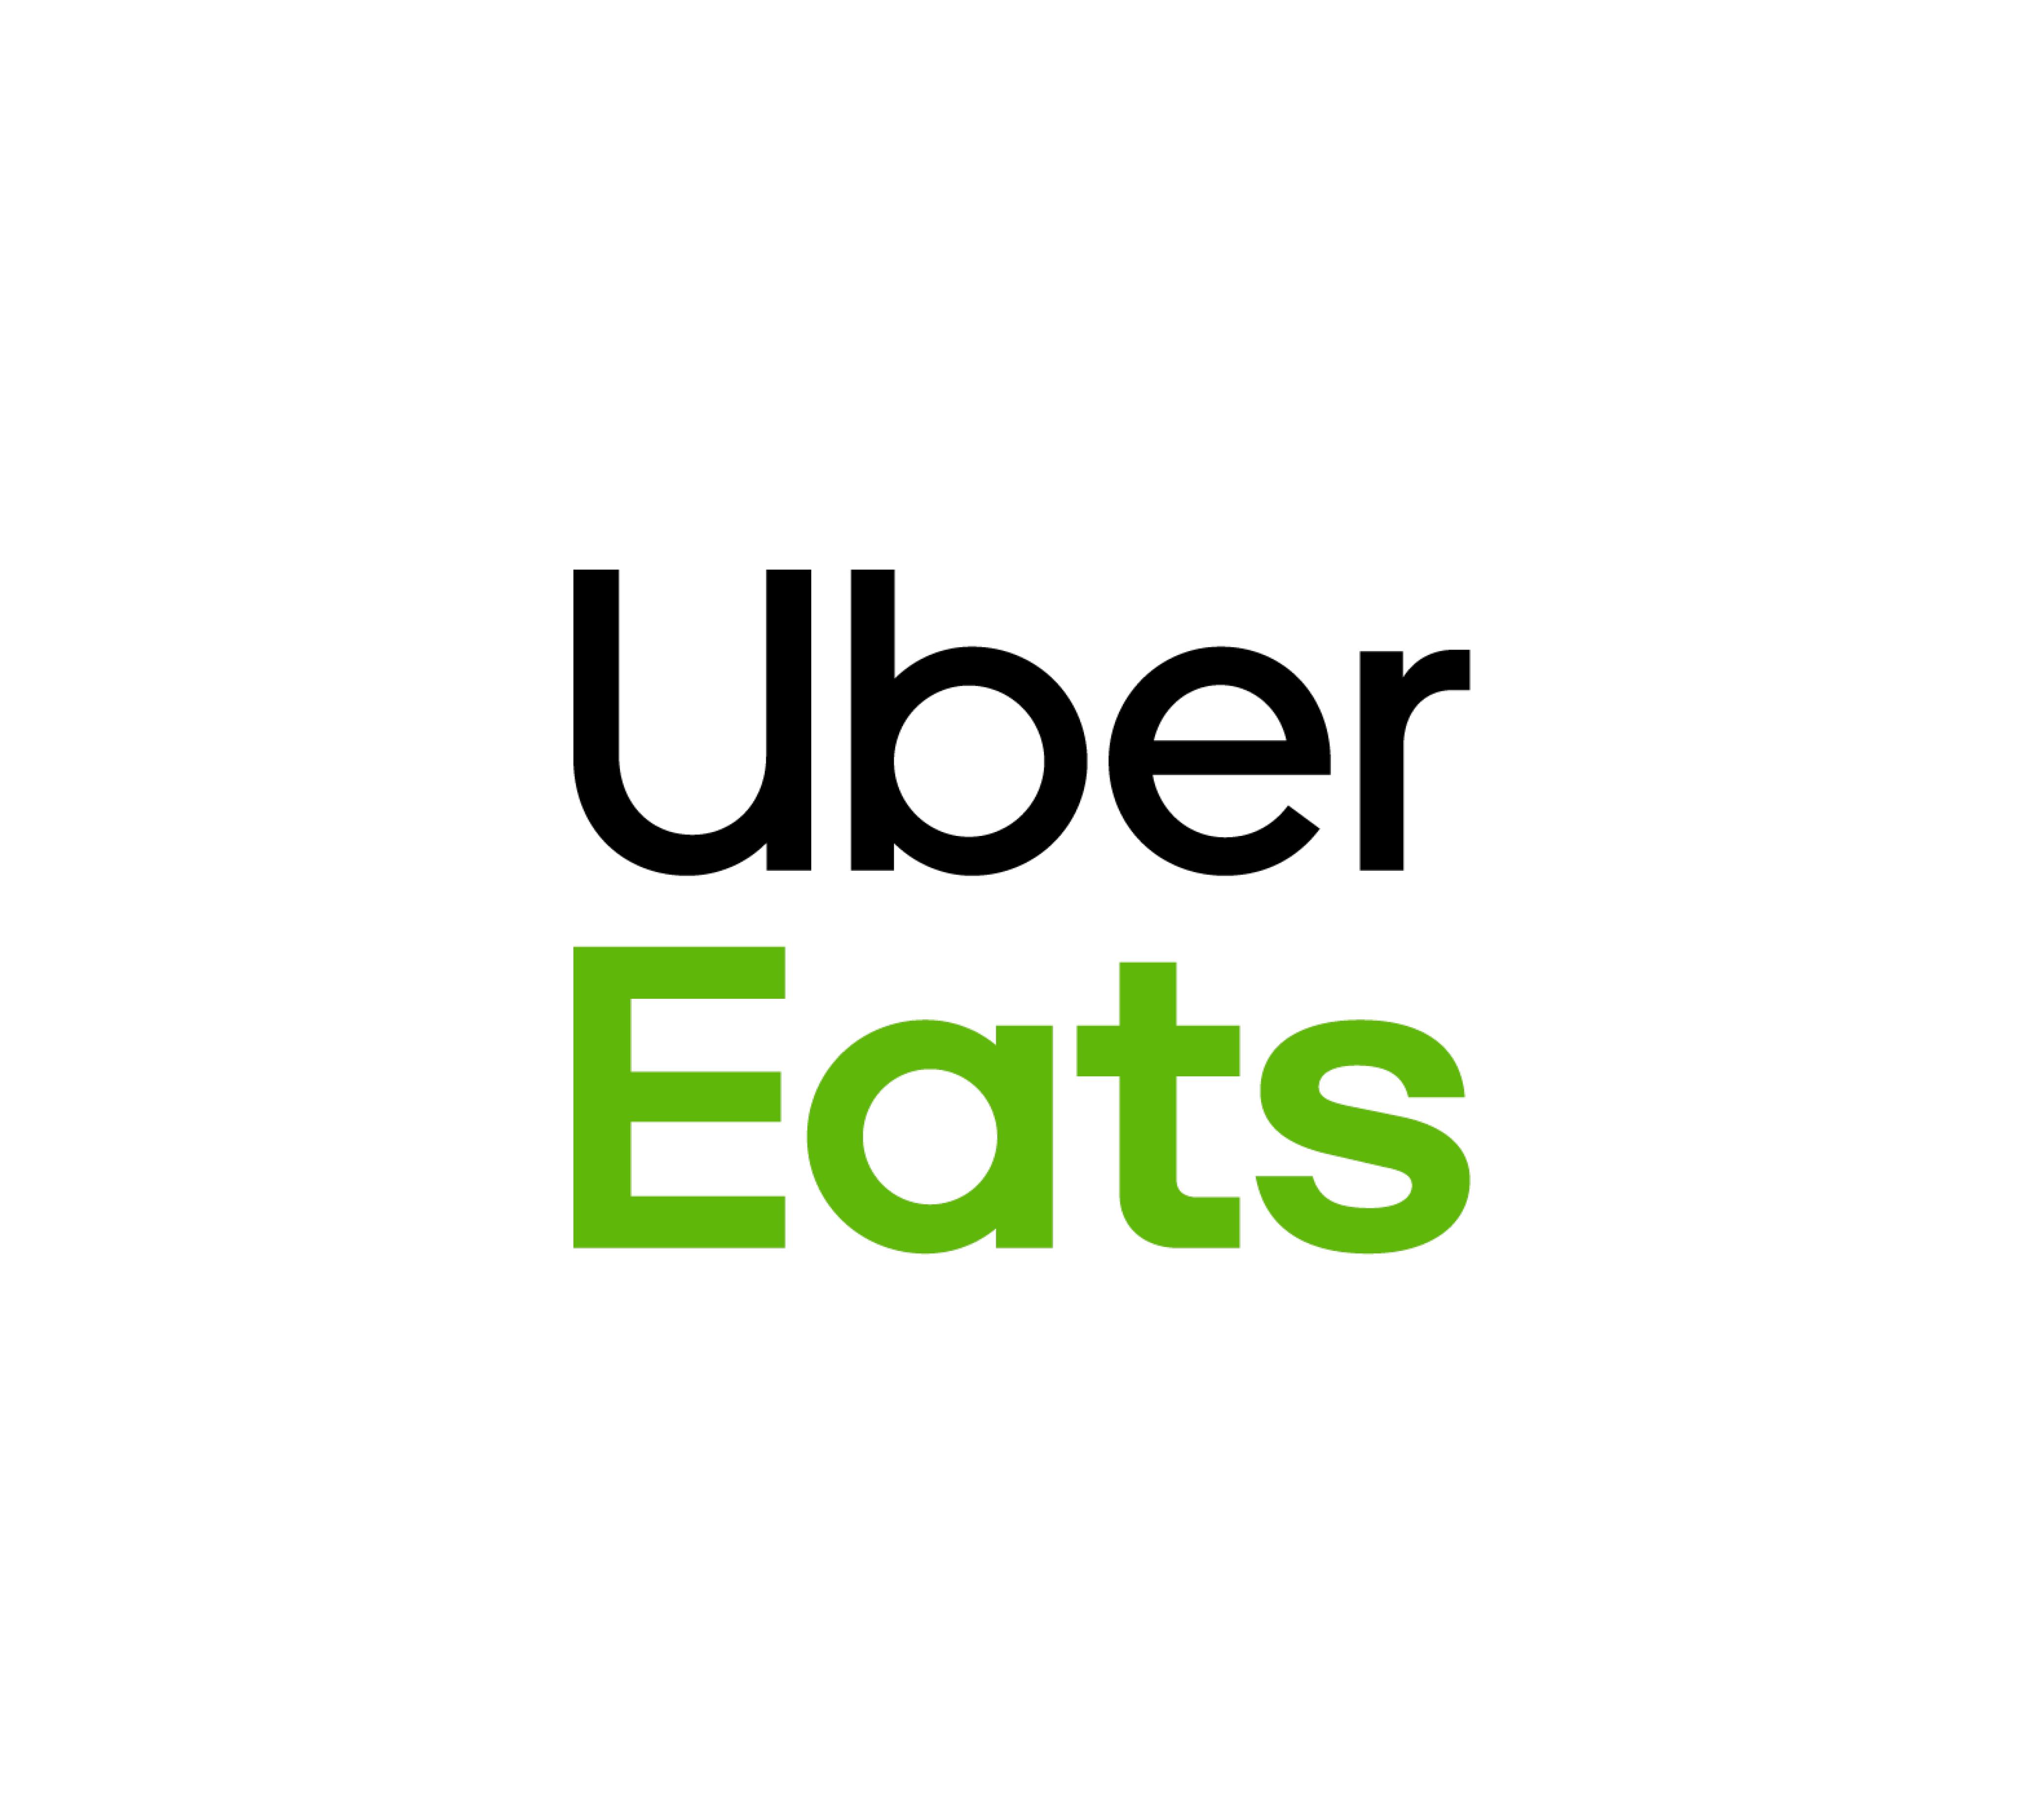 UBER EATS - SOUTIEN DU LYON STREET FOOD FESTIVAL